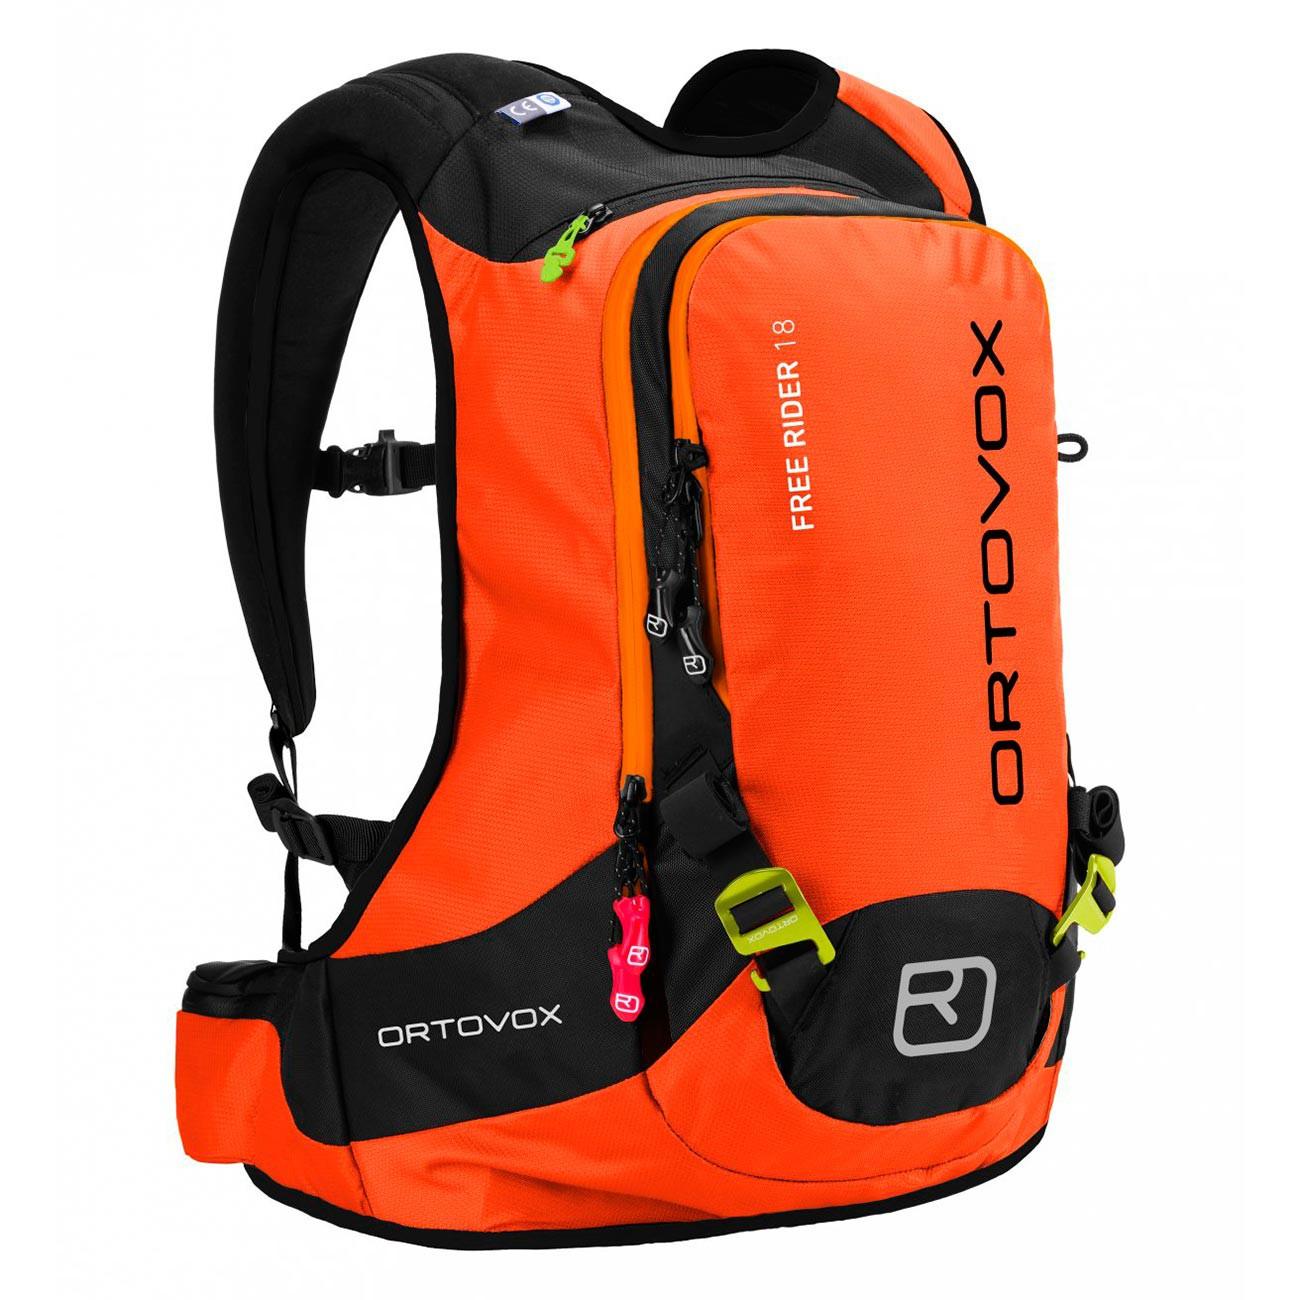 Batoh na snowboard Ortovox Free Rider 18 crazy orange vel.18L 16/17 + doručení do 24 hodin